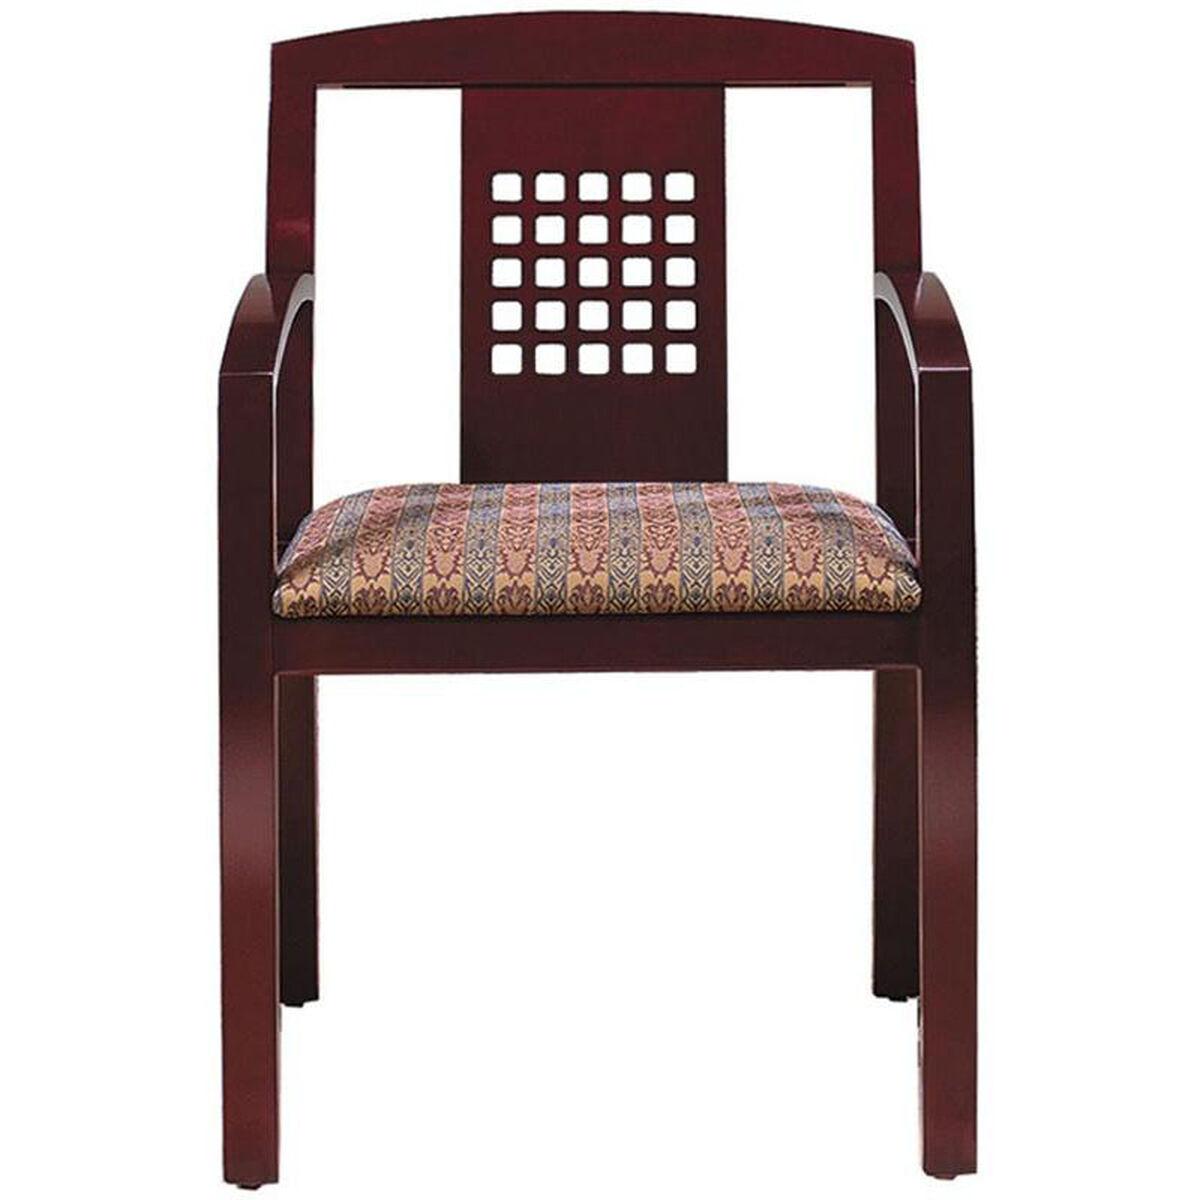 High Point Furniture Industries 9433 Hpf